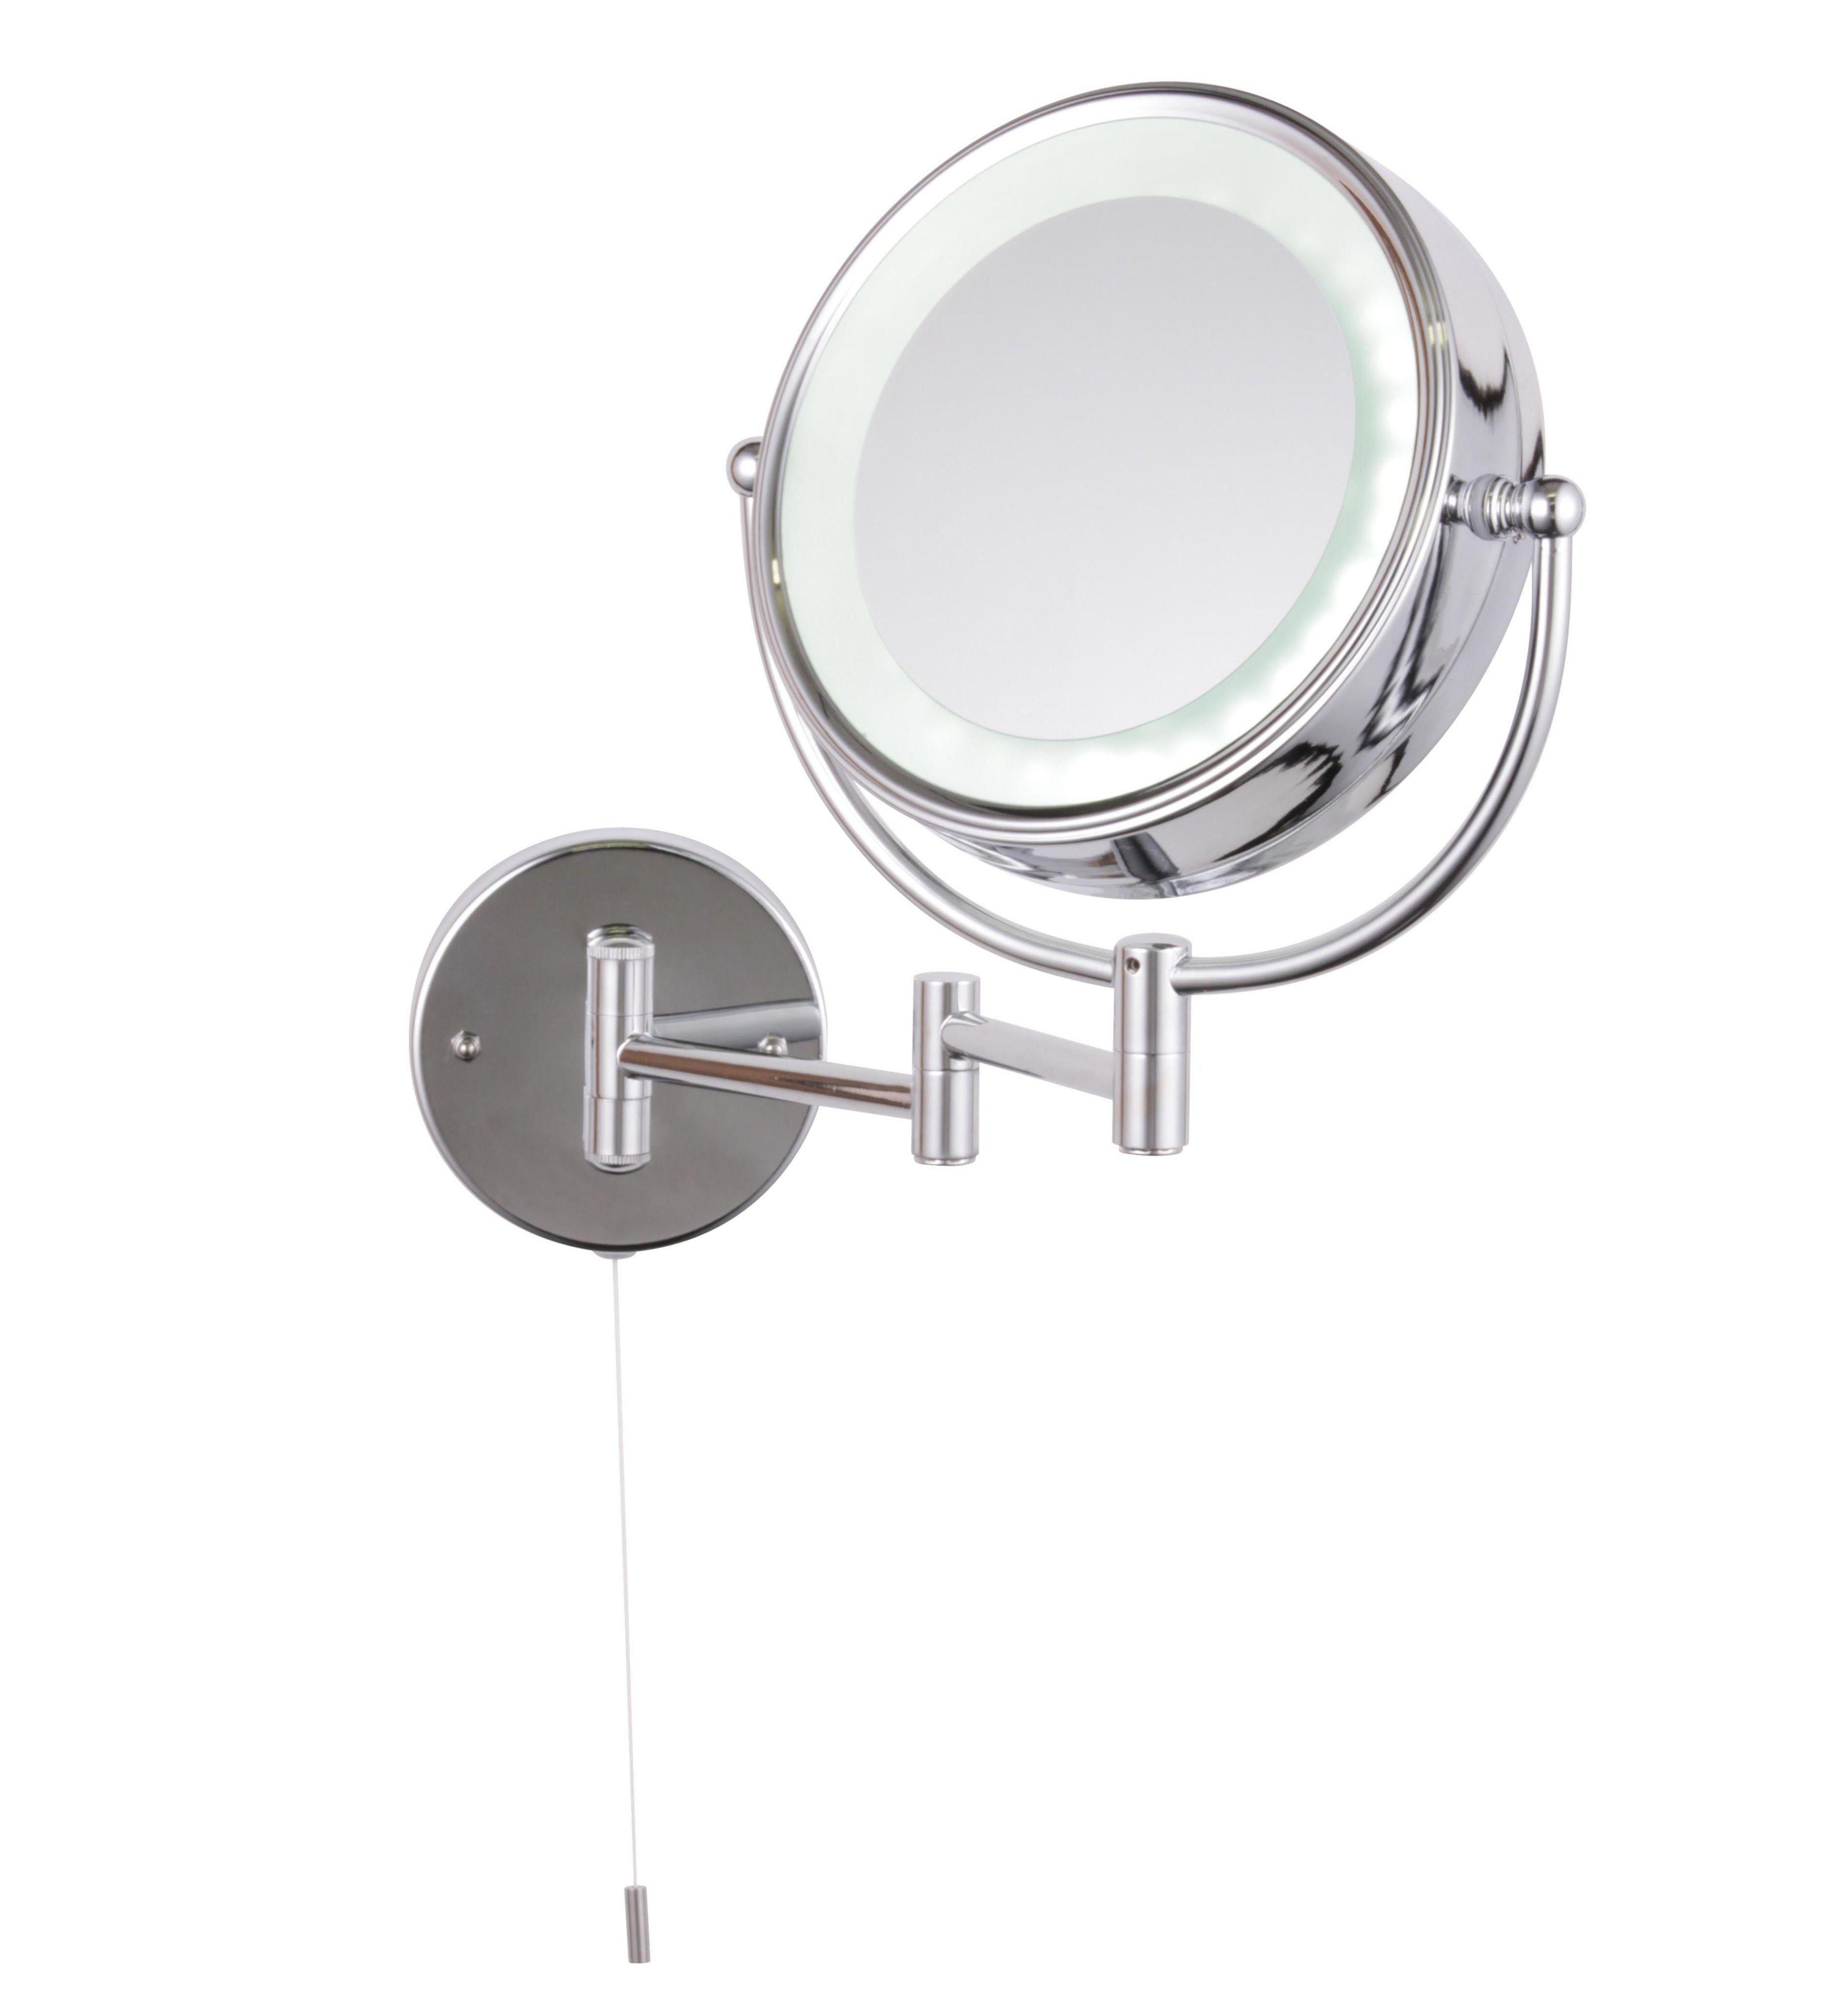 Bathroom gt decorative bathroom wall mirrors gt bathroom wall mirrors - Jenolan Illuminated Bathroom Circular Extendable Mirror W 190mm